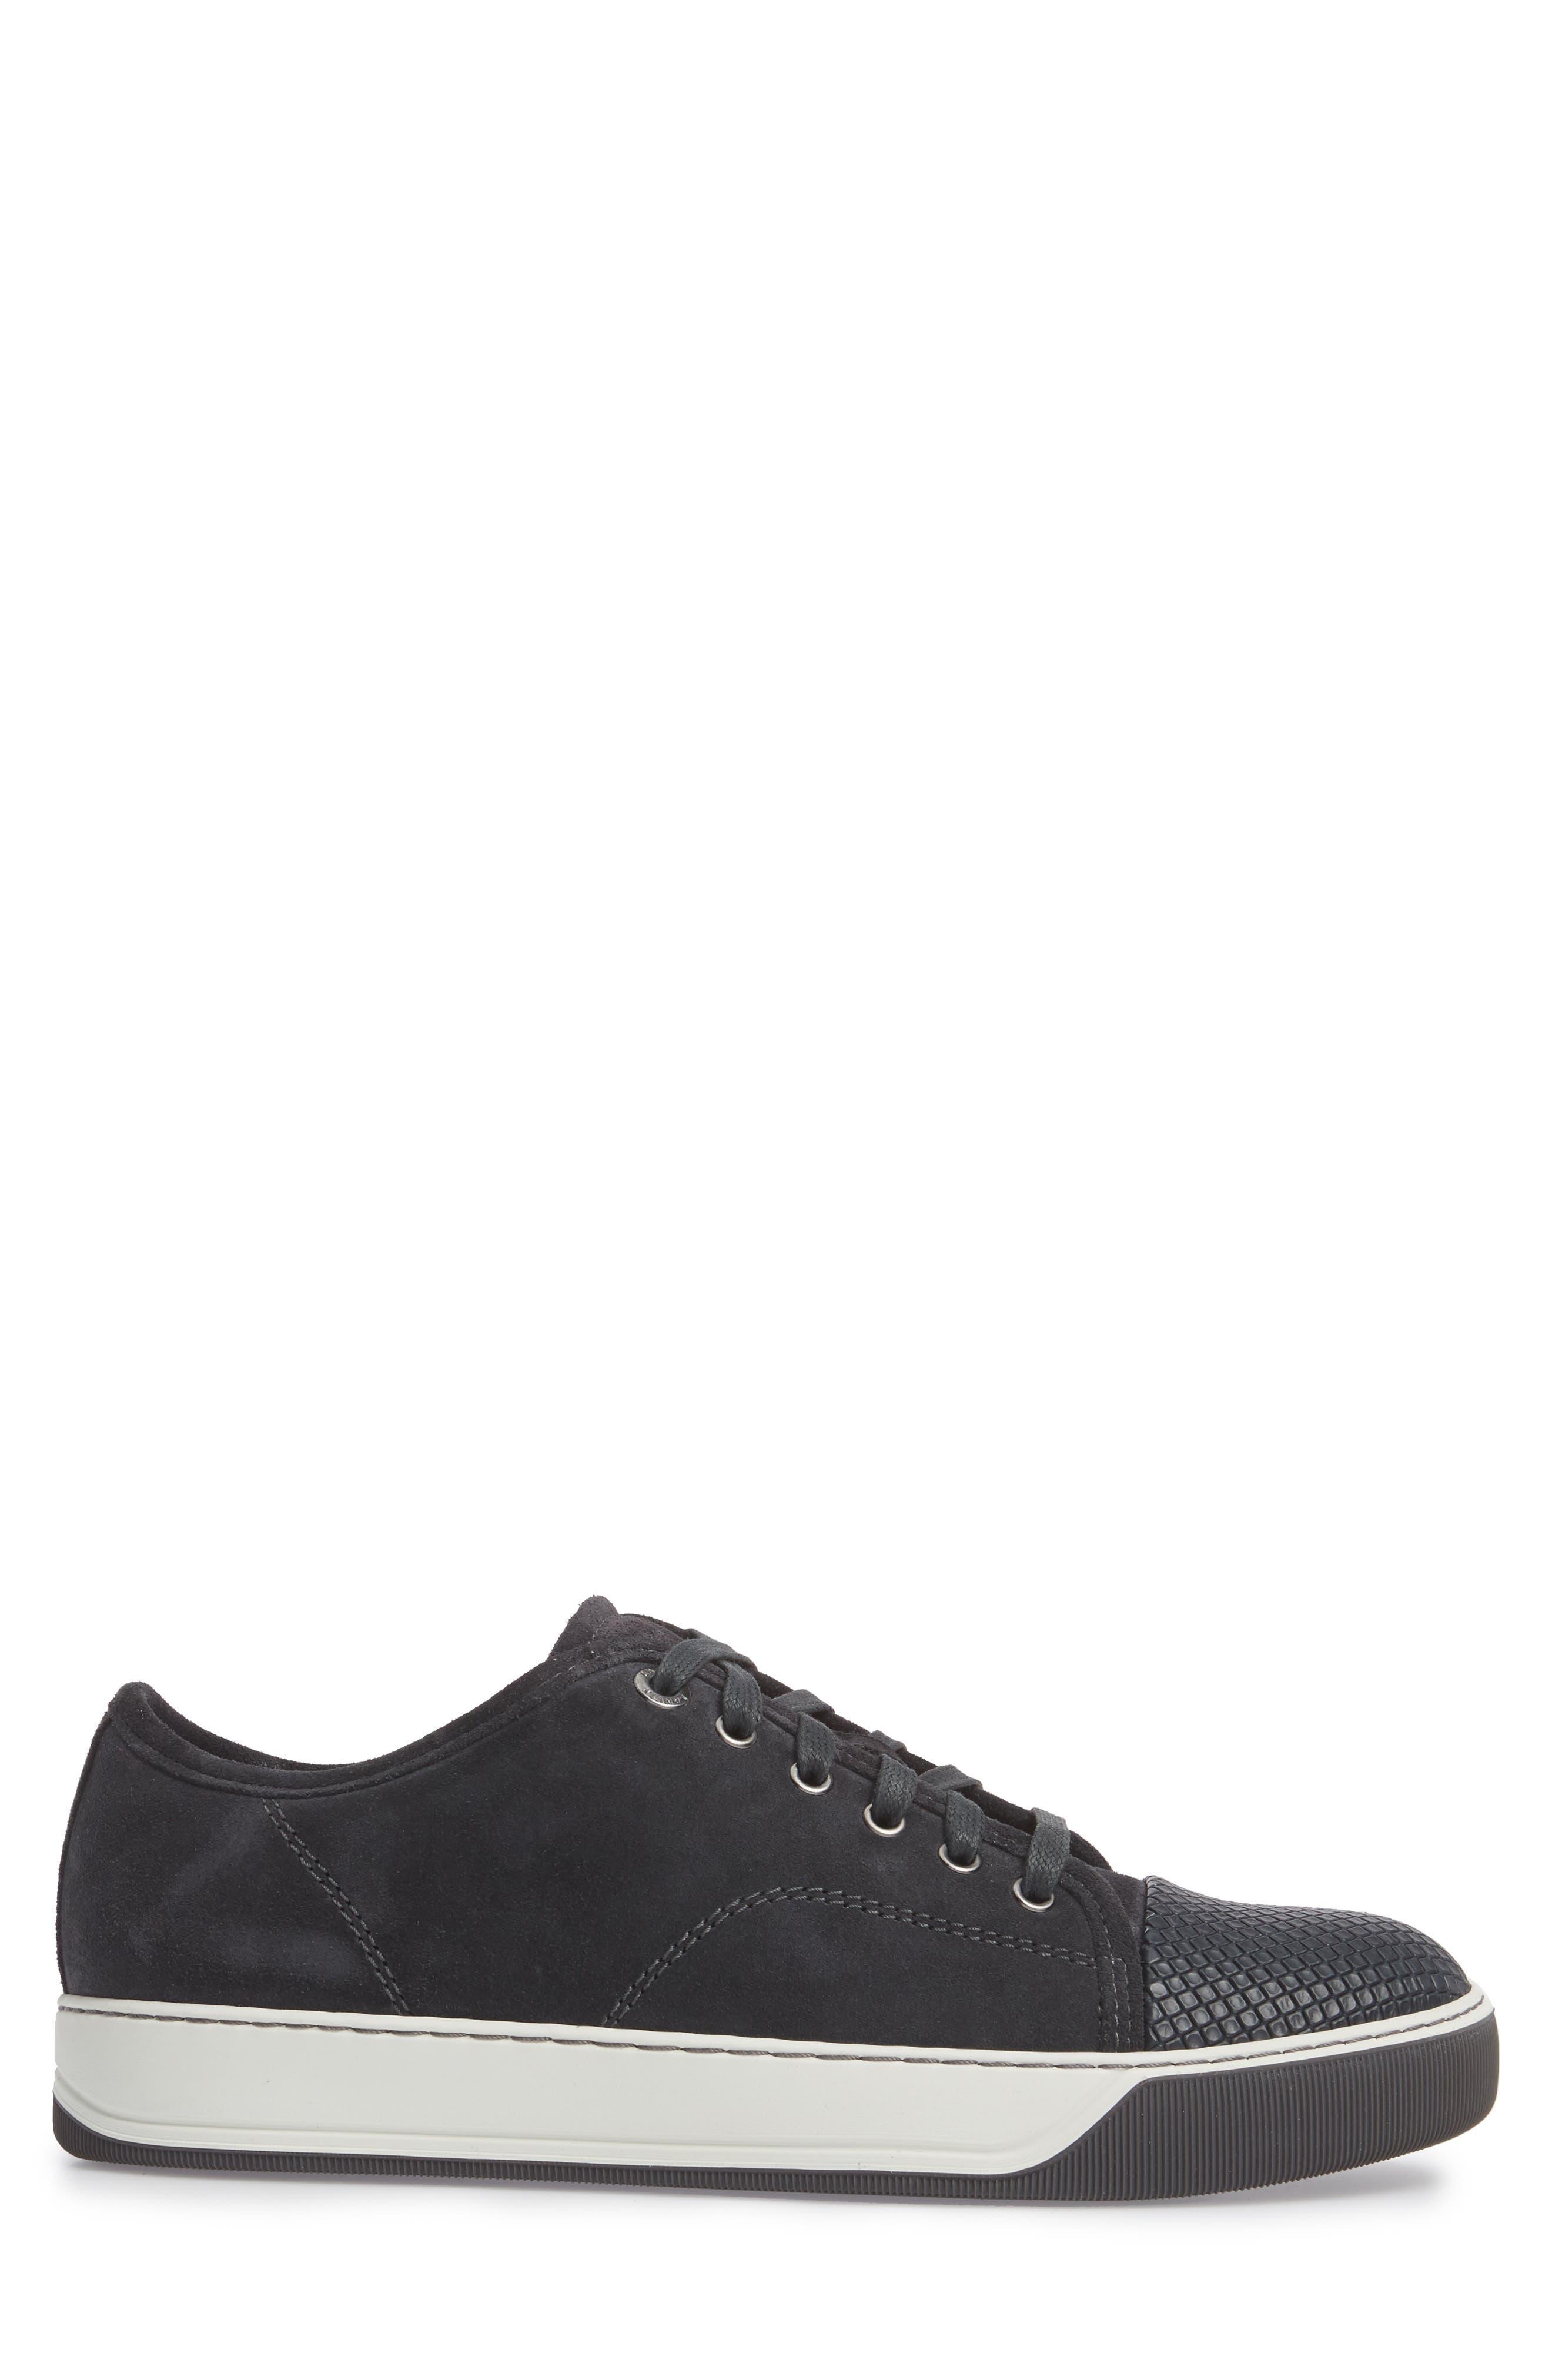 Alternate Image 3  - Lanvin Classic Textured Cap Toe Sneaker (Men)